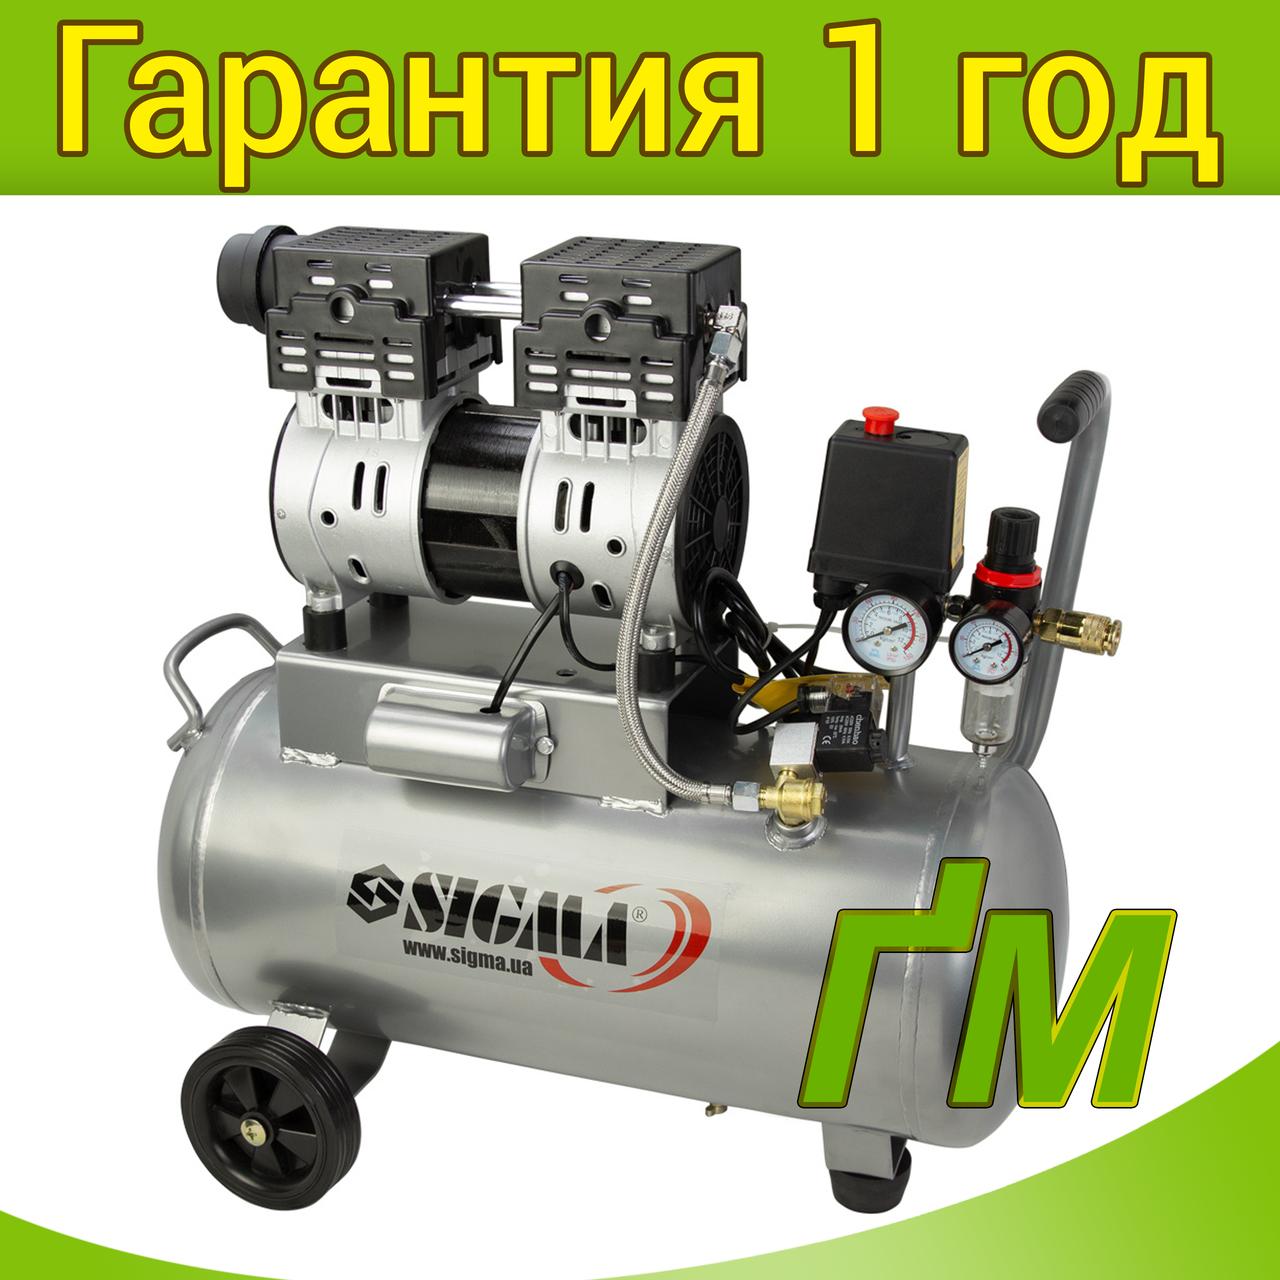 Компрессор двухцилиндровый безмасляный 1.1 кВт, 154 л/мин, 8 бар, 30 л SIGMA (2 крана)